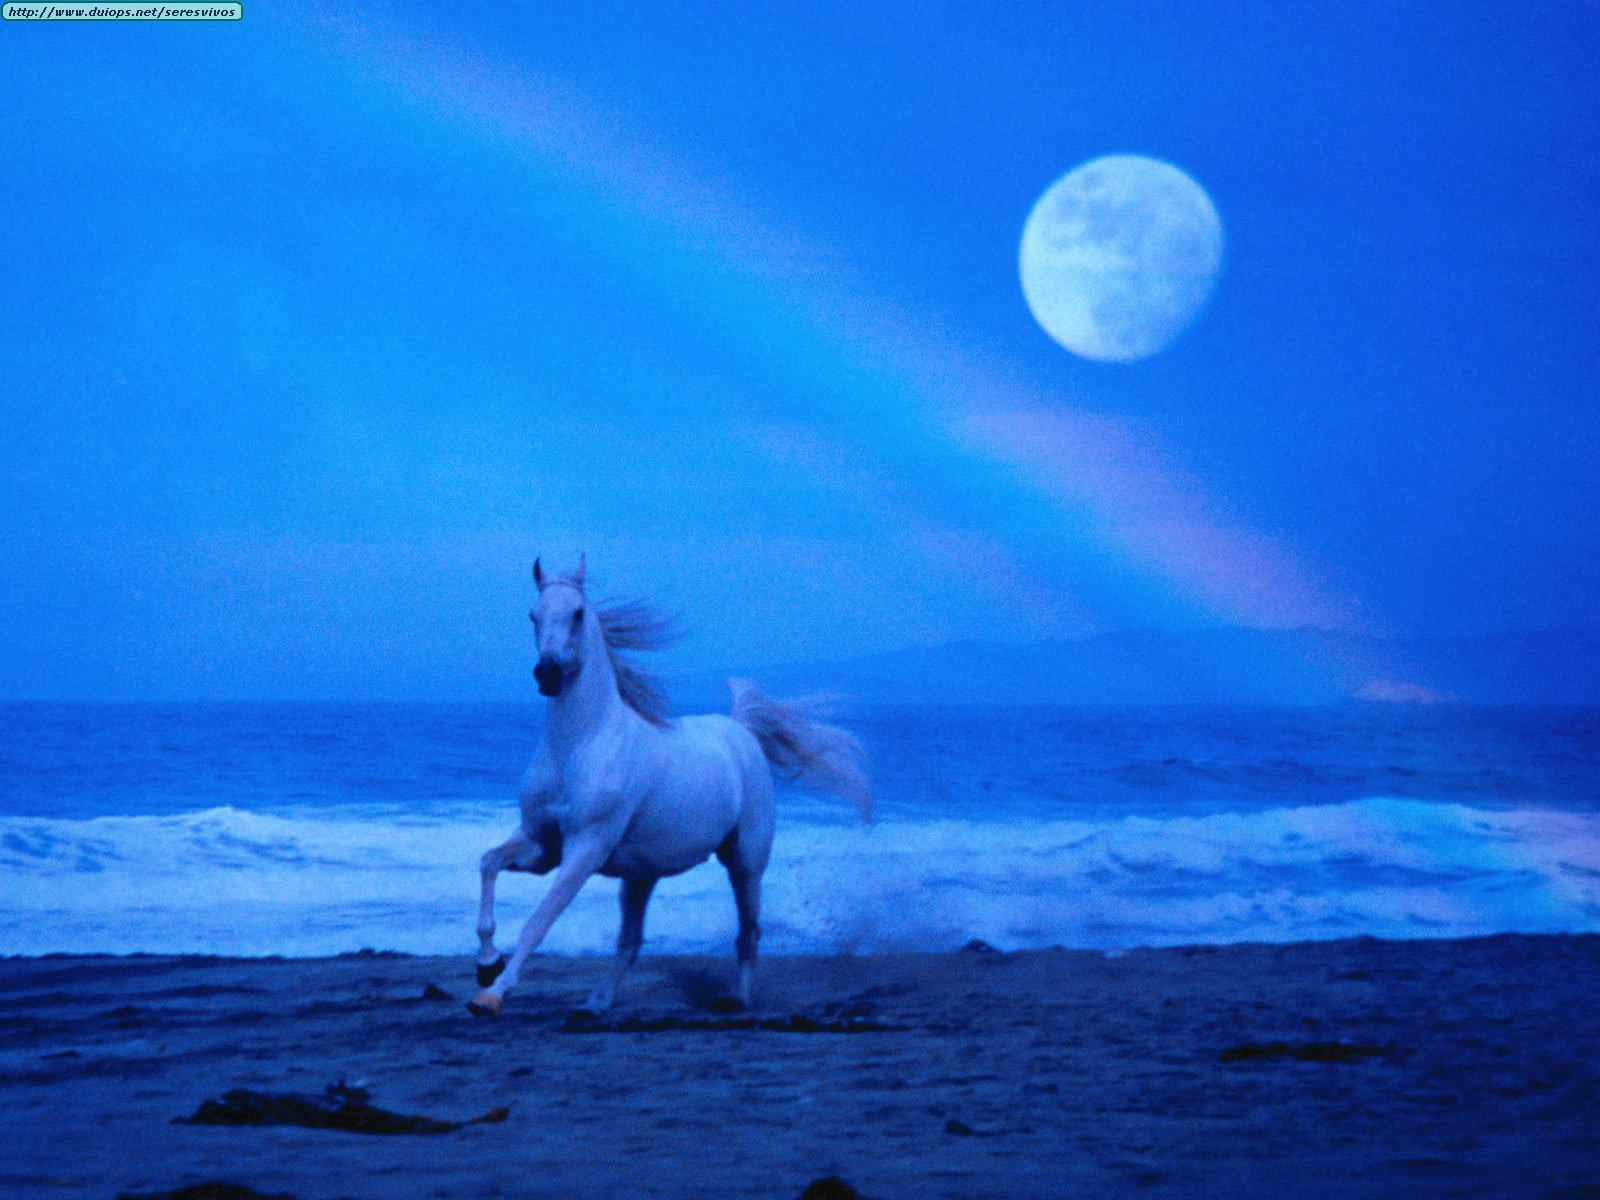 Varias imagenes de caballos